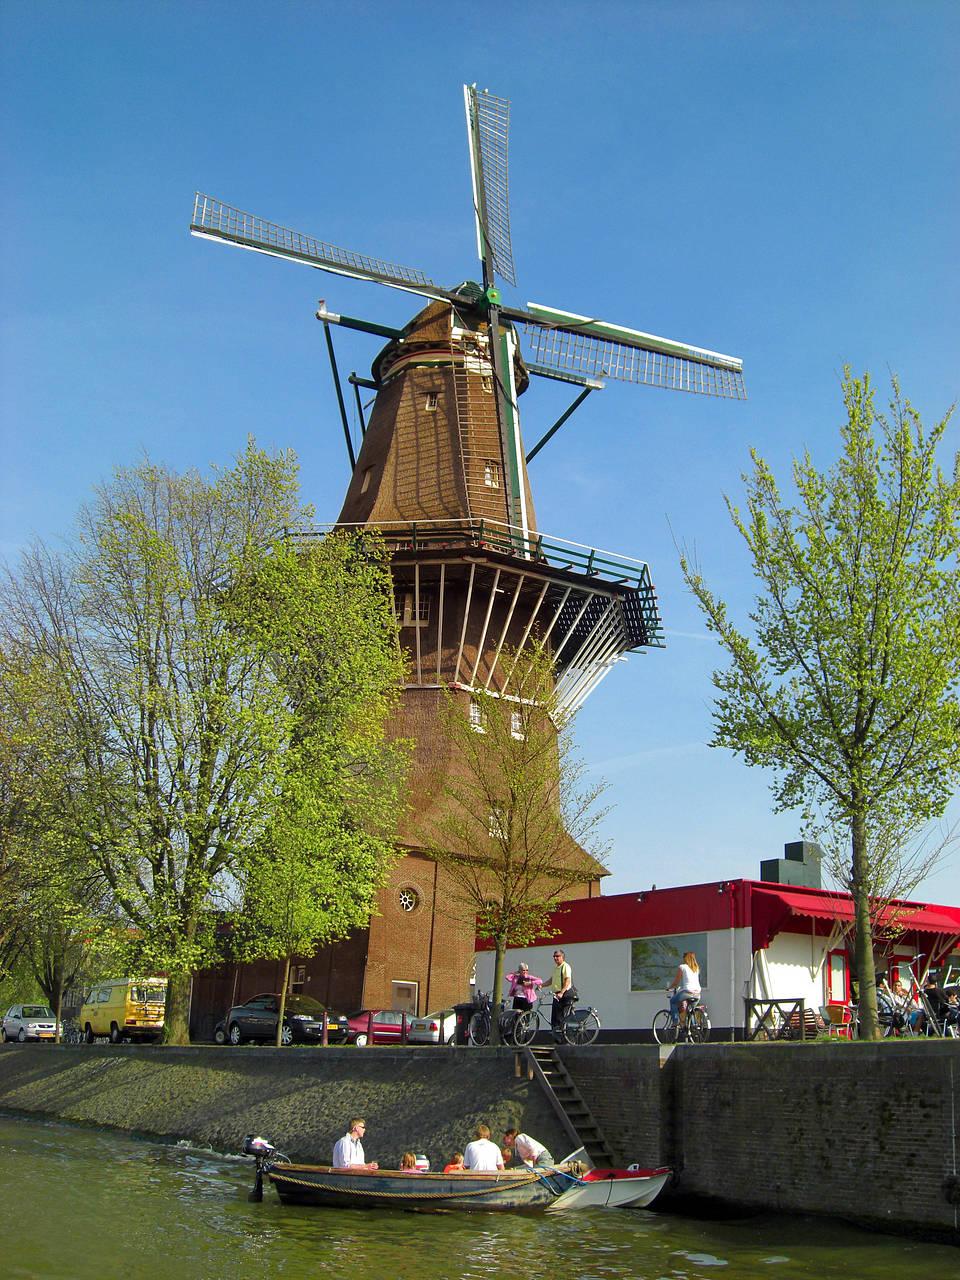 Windmuhle amsterdam